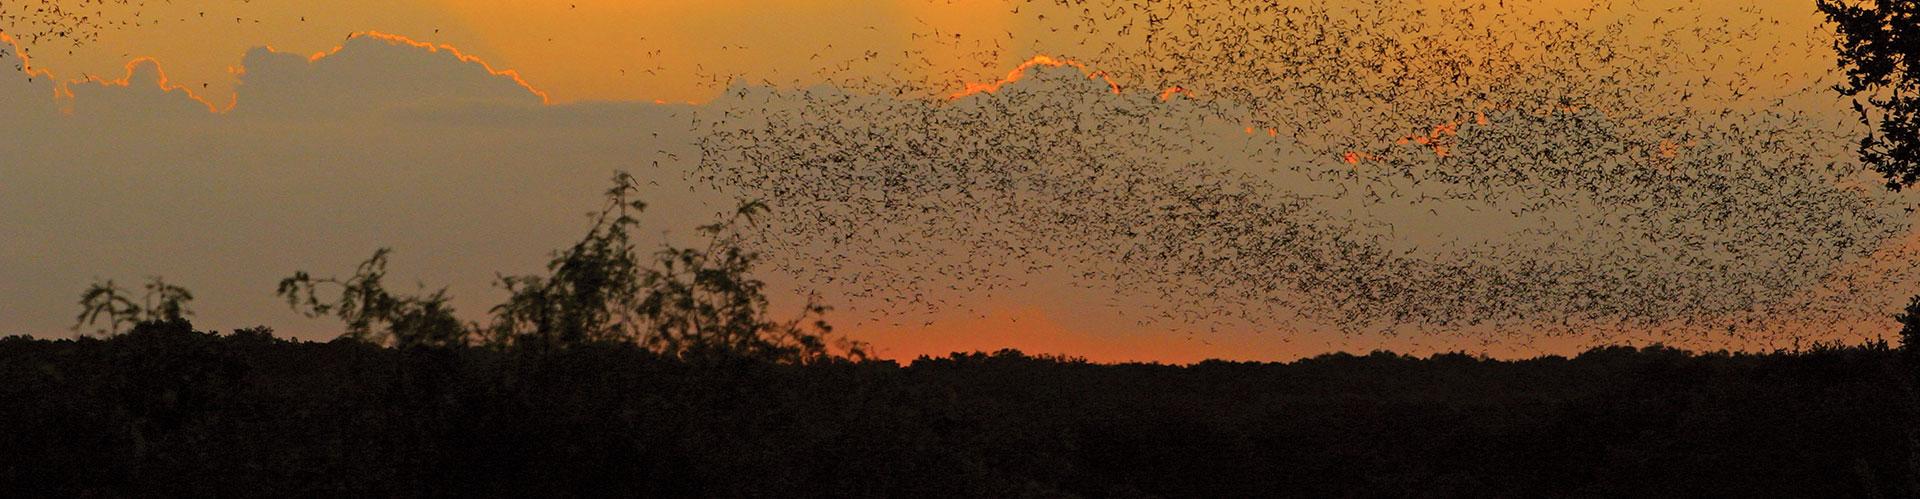 Colony of Bats in Flight at Dusk